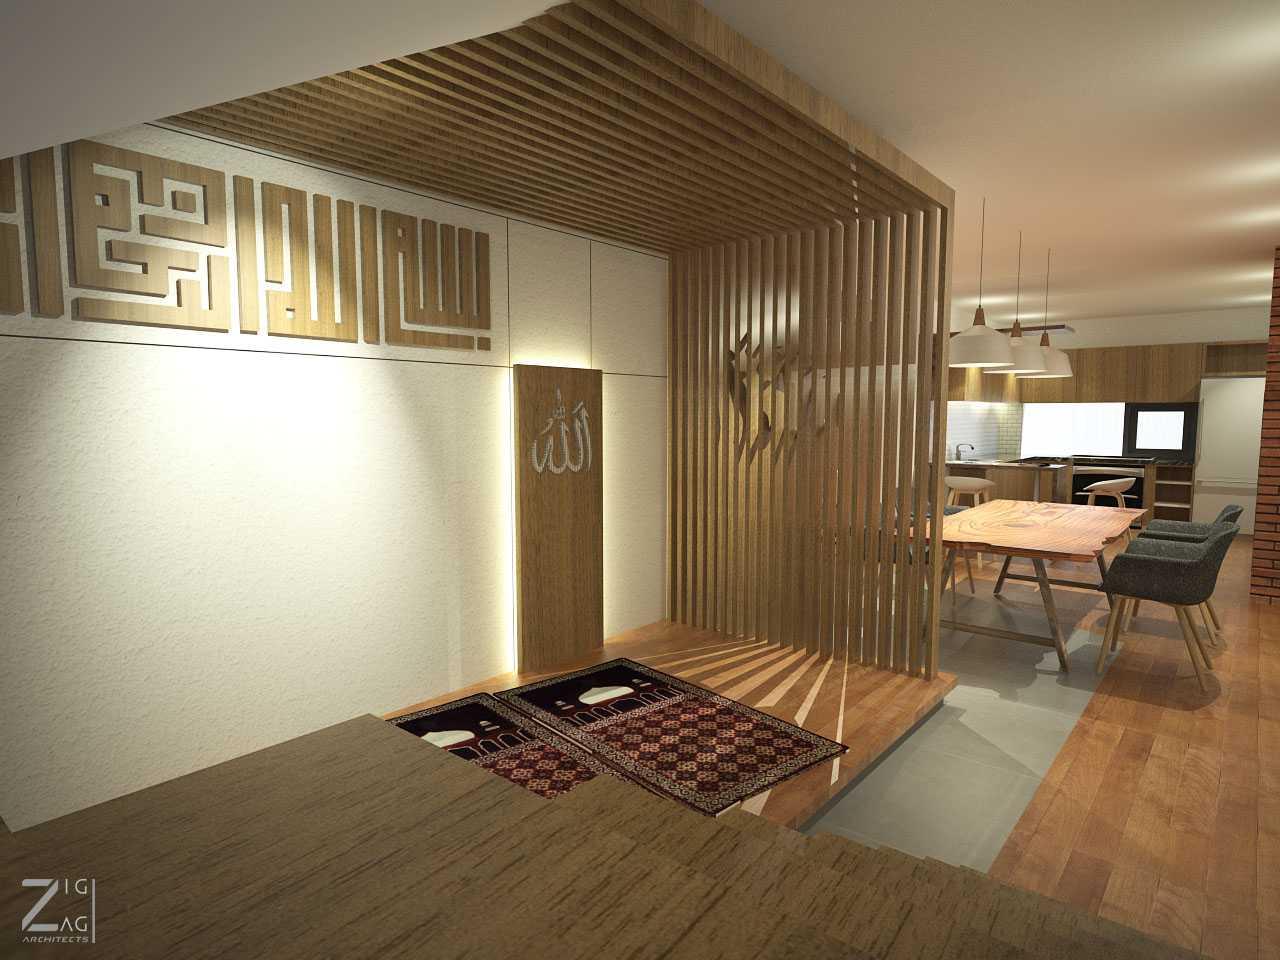 Zigzag Architecture Studio Pulomas House Daerah Khusus Ibukota Jakarta, Indonesia  Mushollaview01  37608